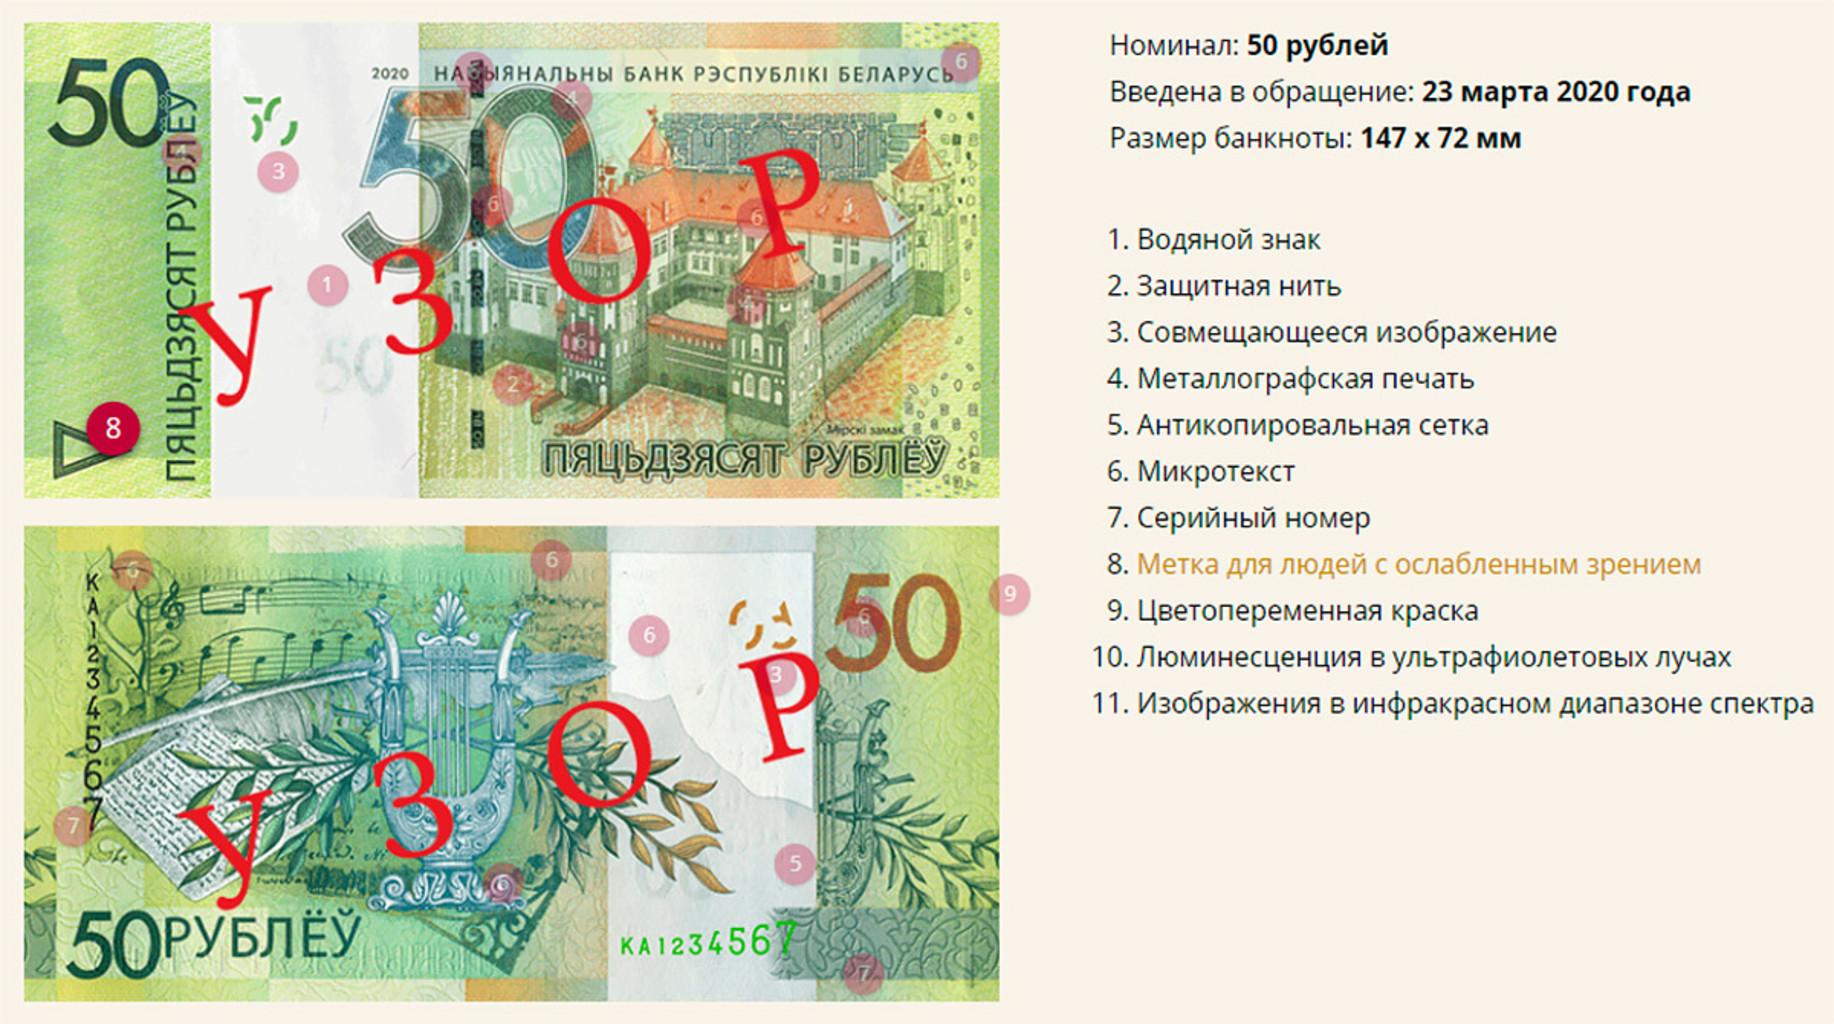 50 rubley banknota